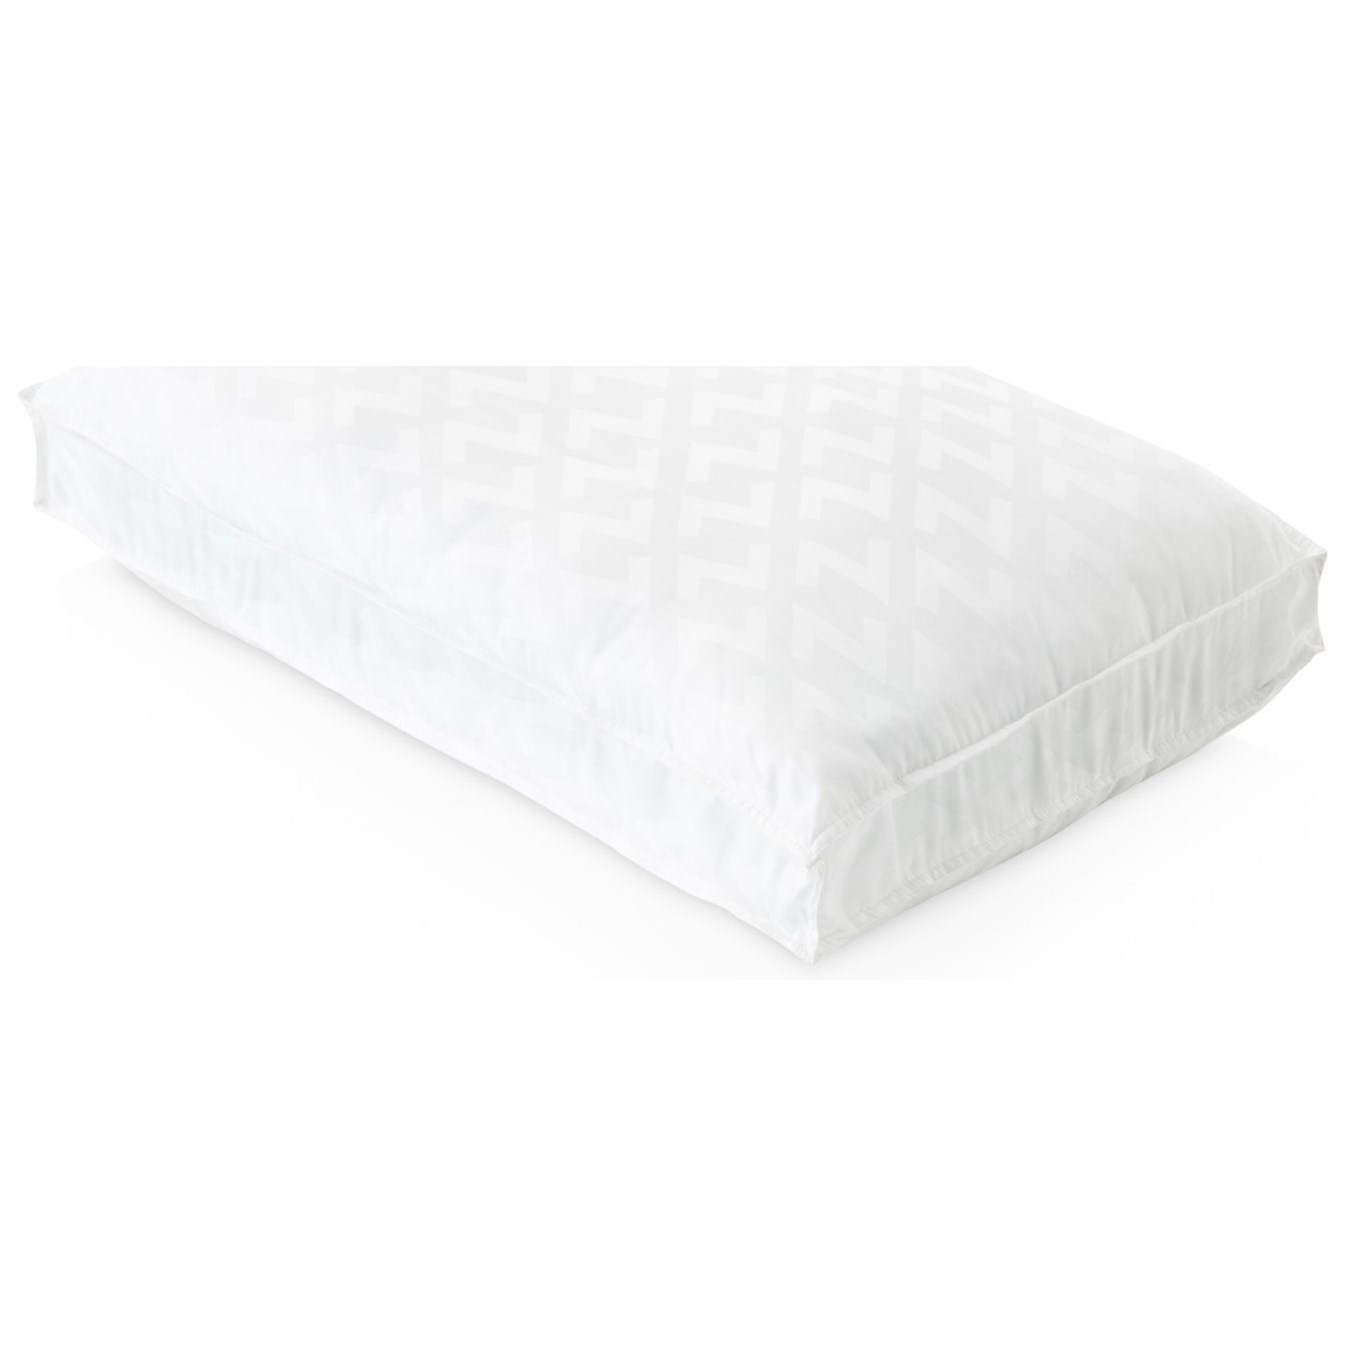 Malouf Gel Convolution™ Standard Gel Convolution™ Low Loft Pillow - Item Number: ZZSSLPCOGF